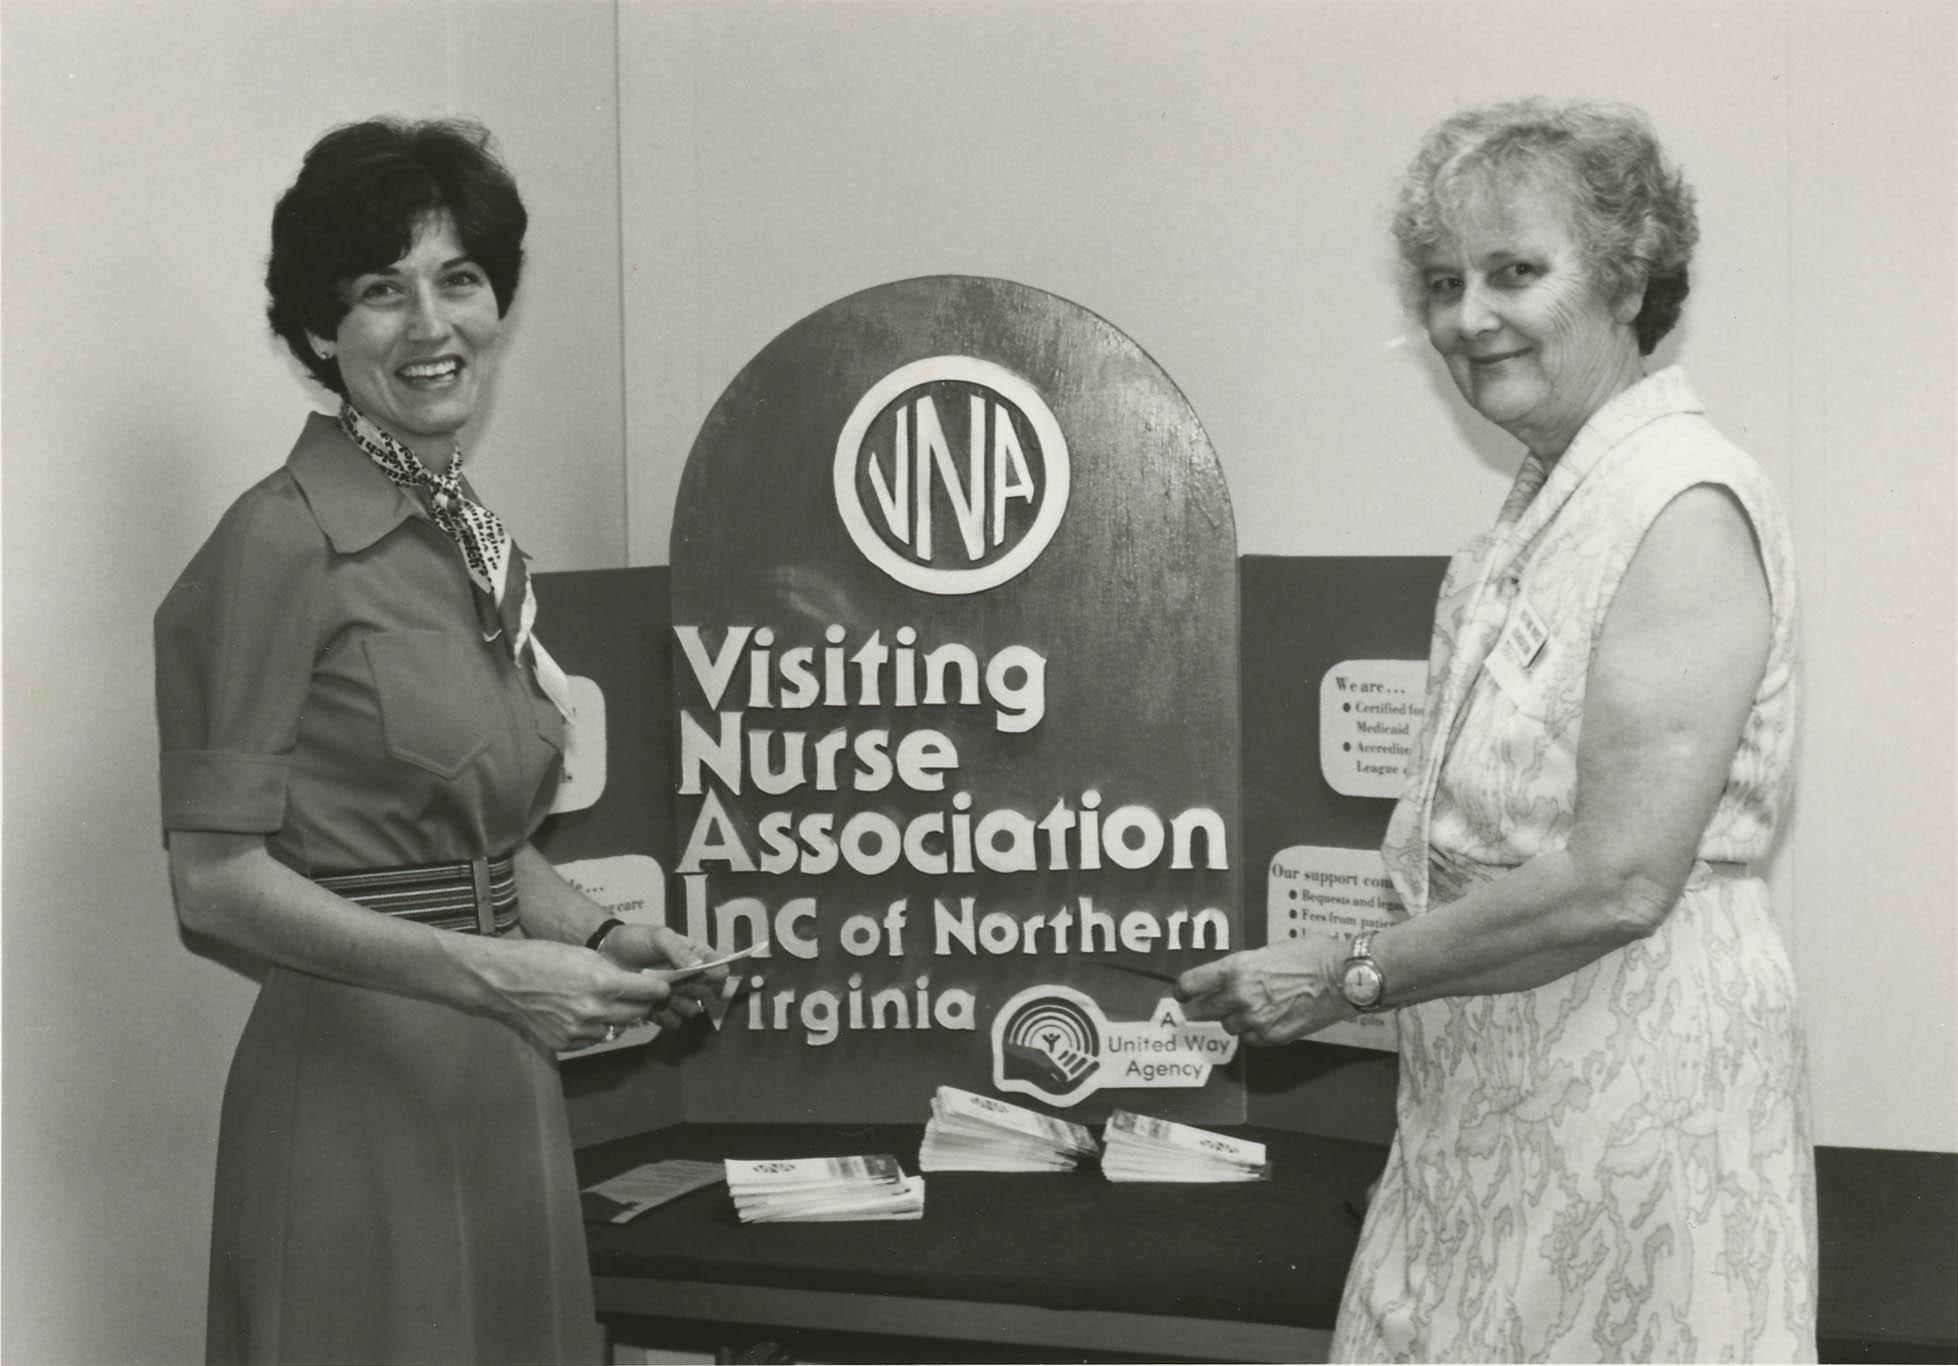 Emilie Deady of the Visiting Nurse Association